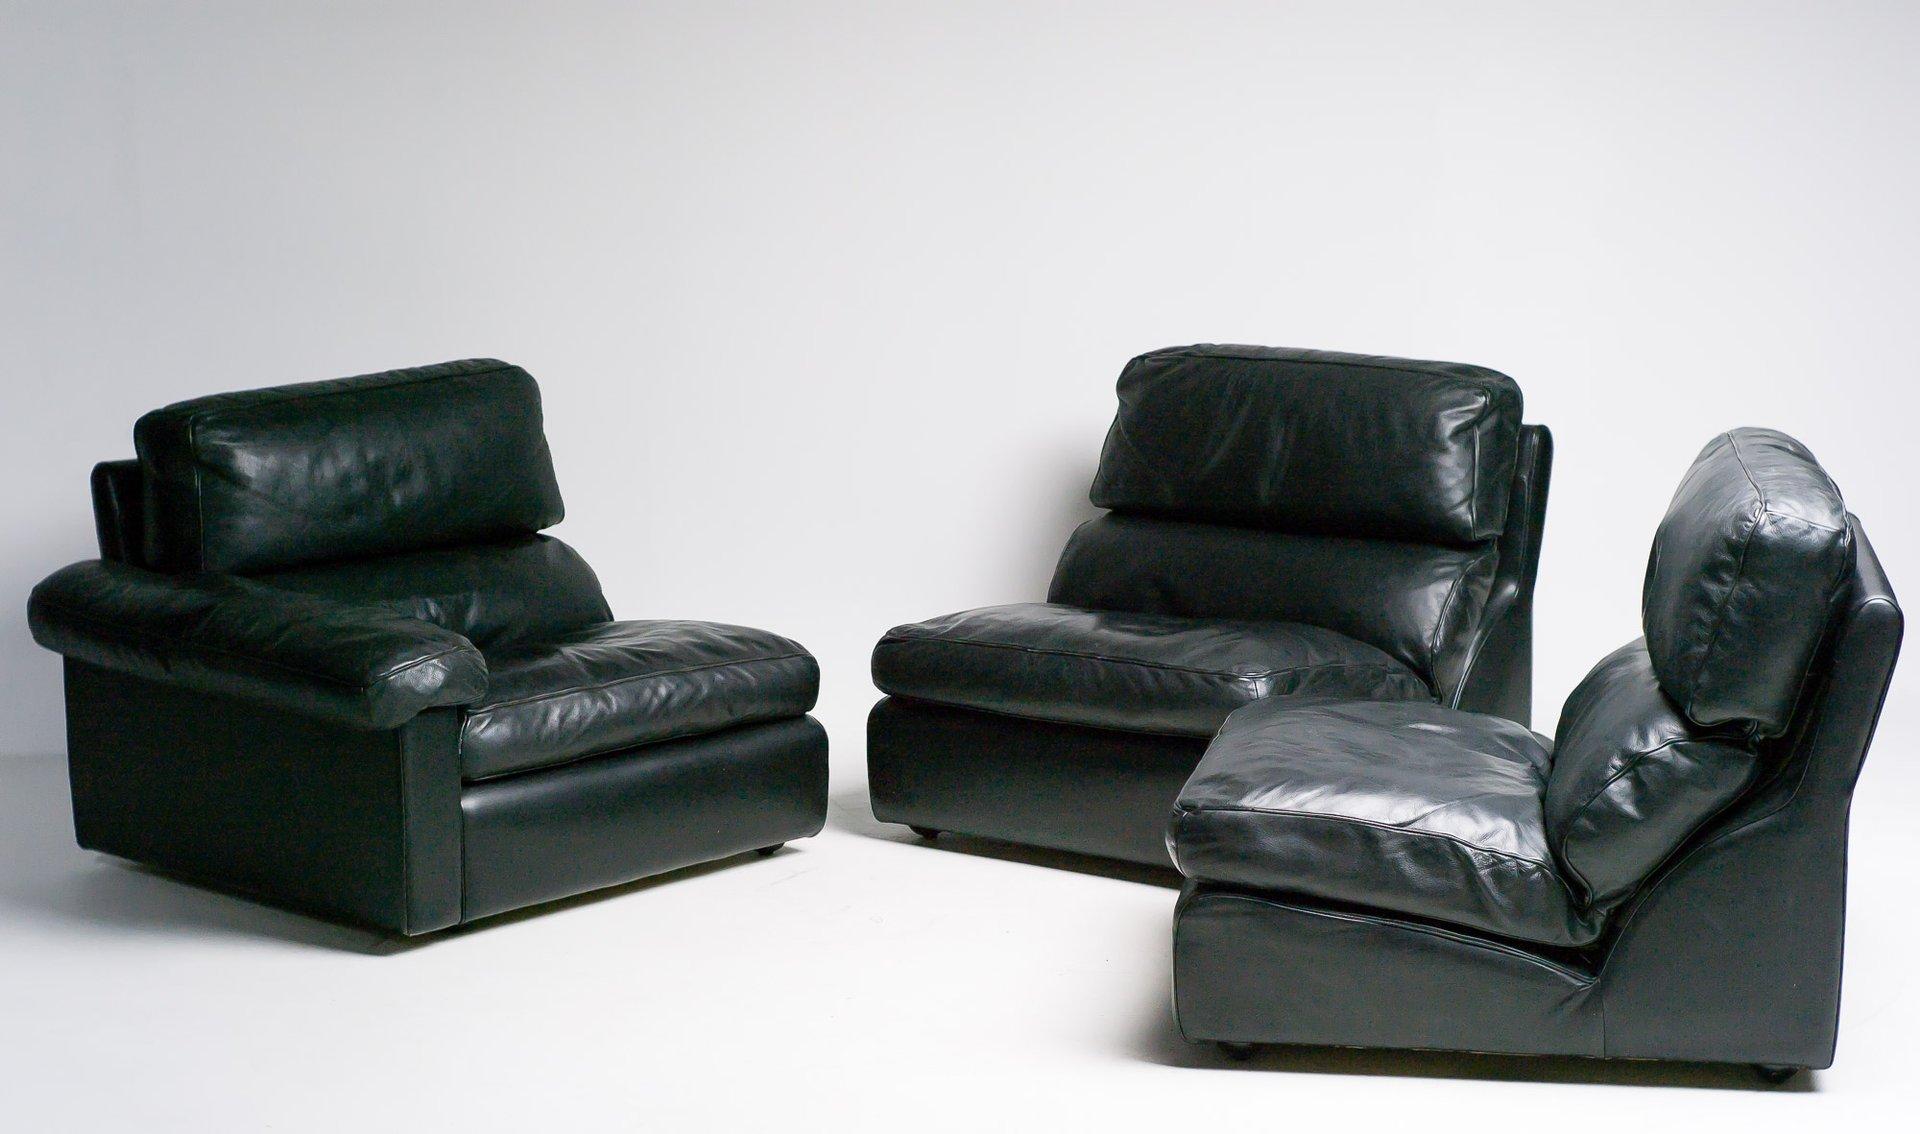 italienisches modulares sofa von tito agnoli f r poltrona frau 1970er bei pamono kaufen. Black Bedroom Furniture Sets. Home Design Ideas